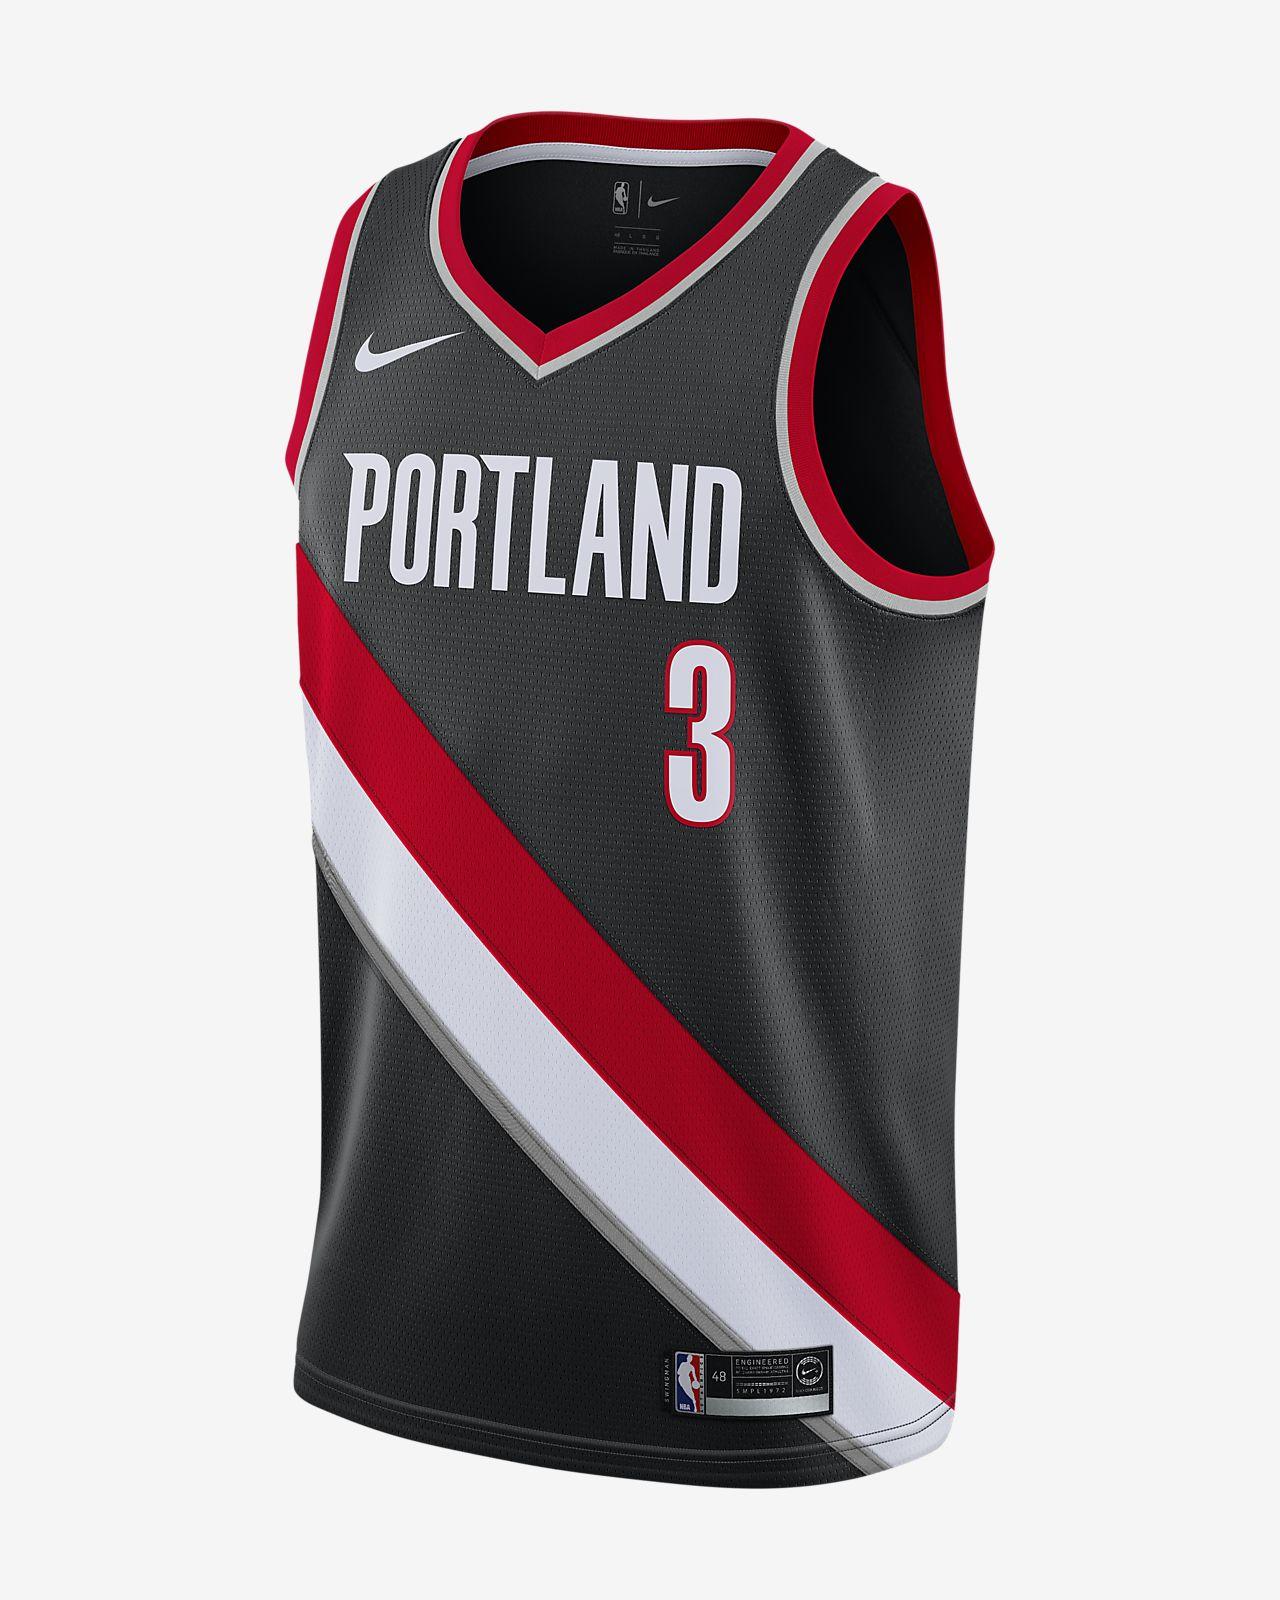 Camiseta conectada Nike NBA para hombre C. J. McCollum Icon Edition Swingman Jersey (Portland Trail Blazers)